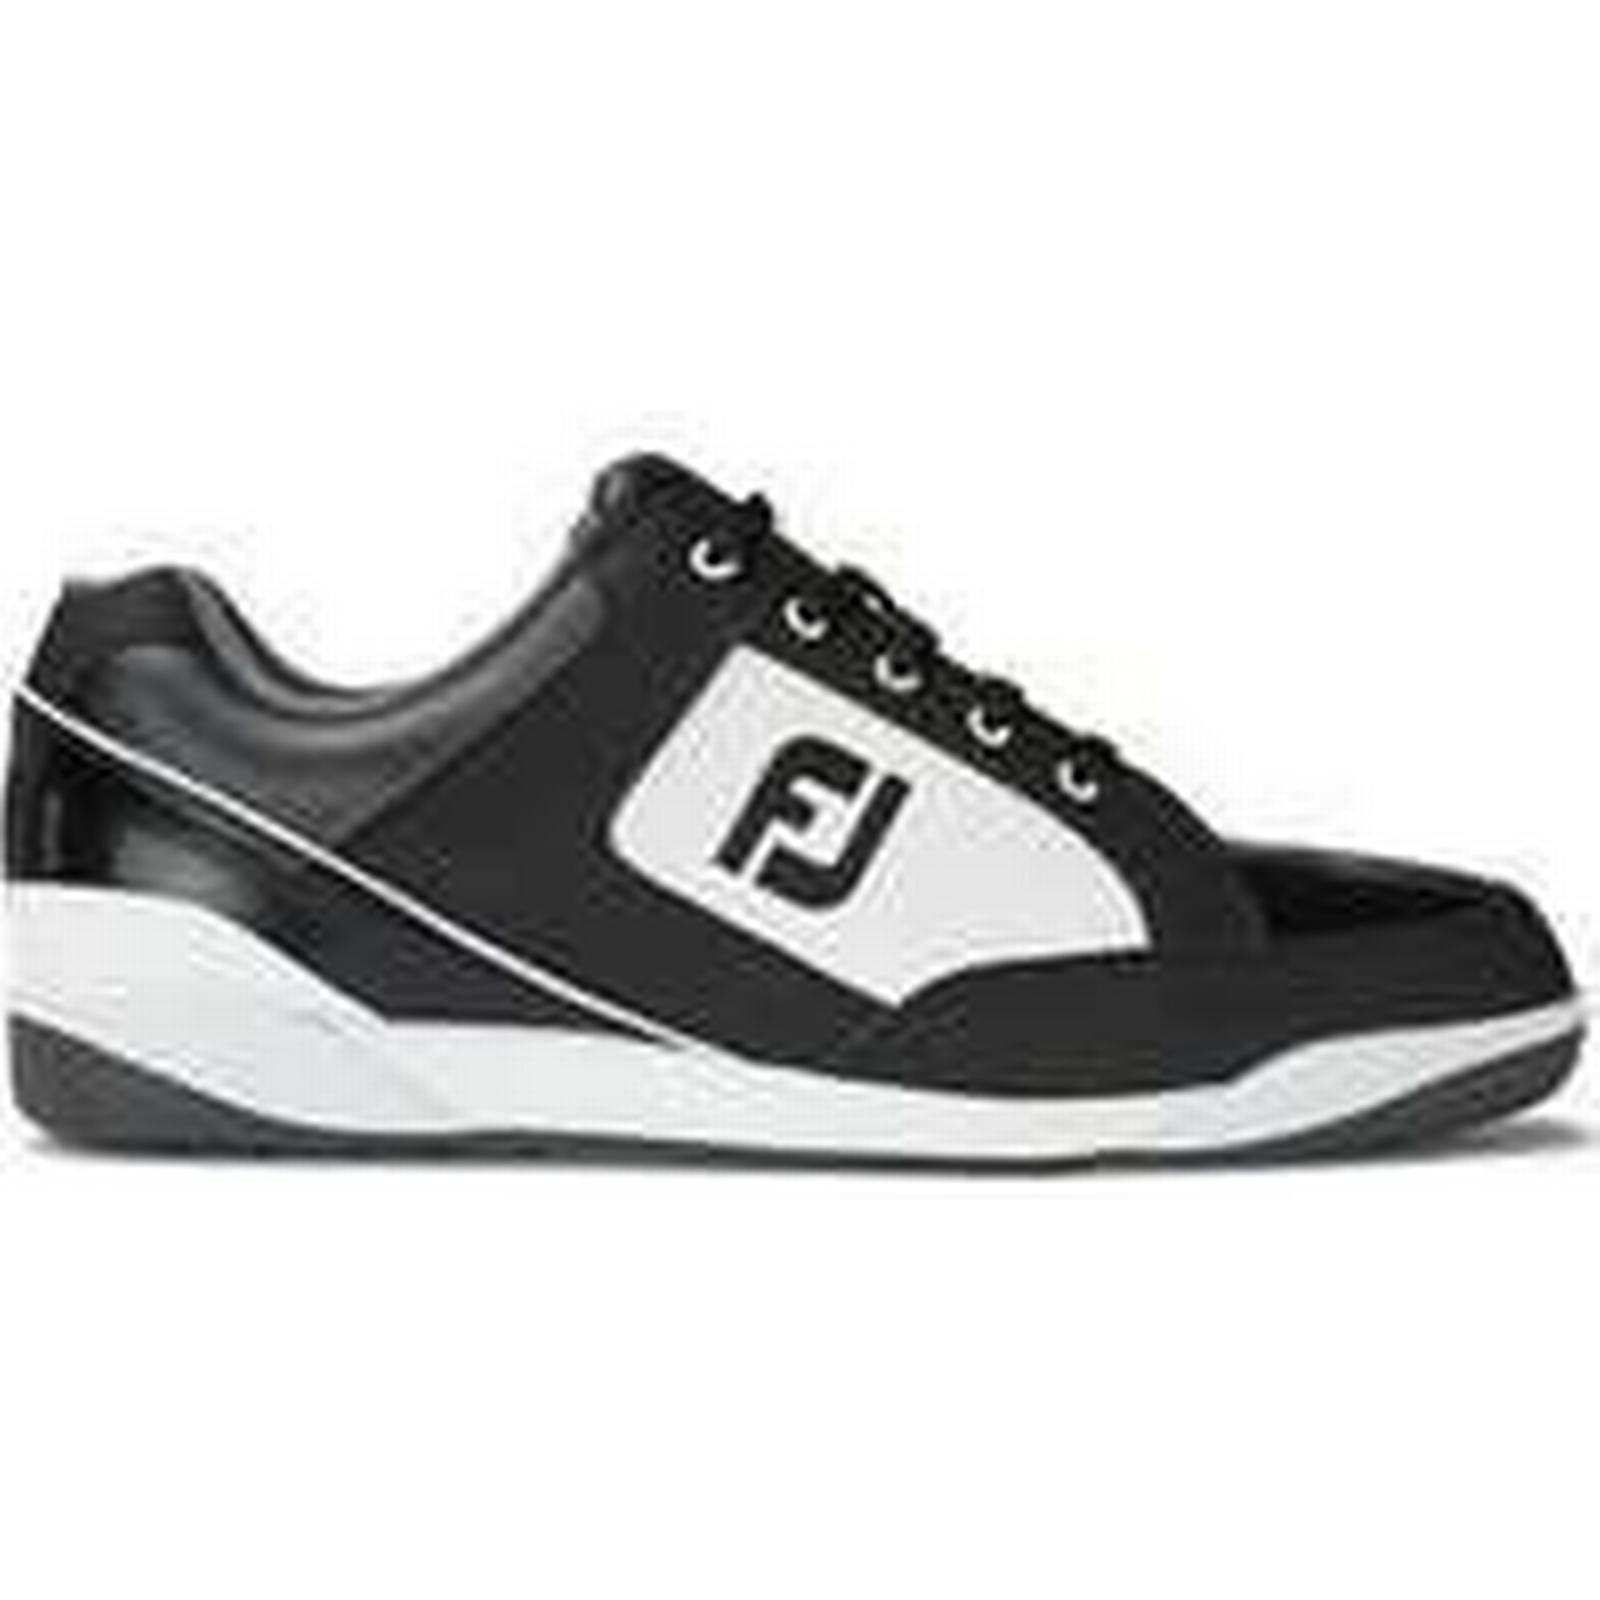 FJ Originals Size: 18 Spikeless - Black/White Size: Originals 7 225449